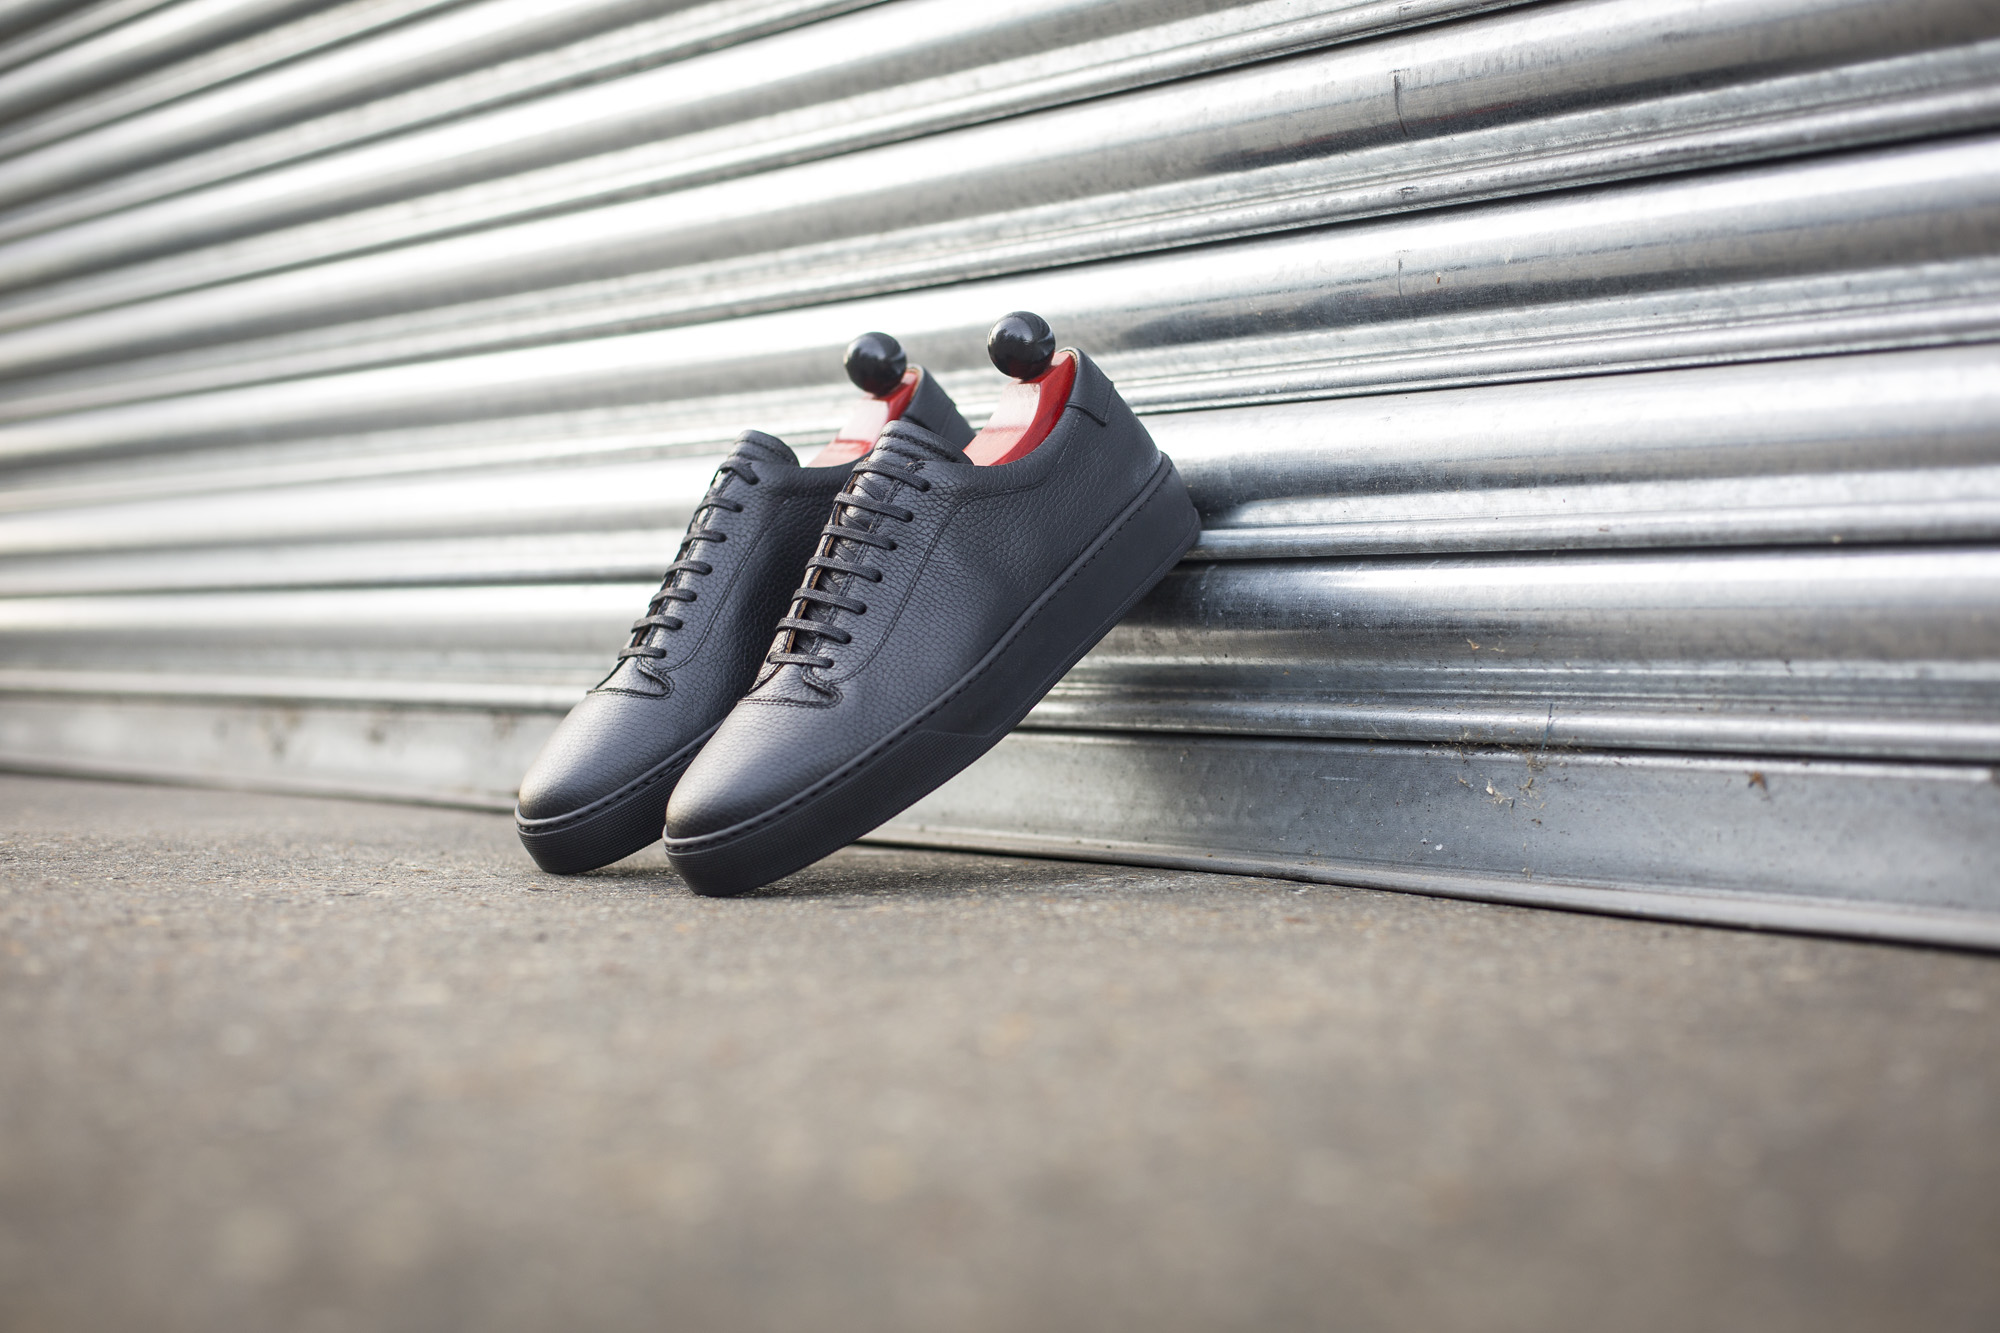 j-fitzpatrick-footwear-collection-9-november-2017-hero-trainers-0155.jpg